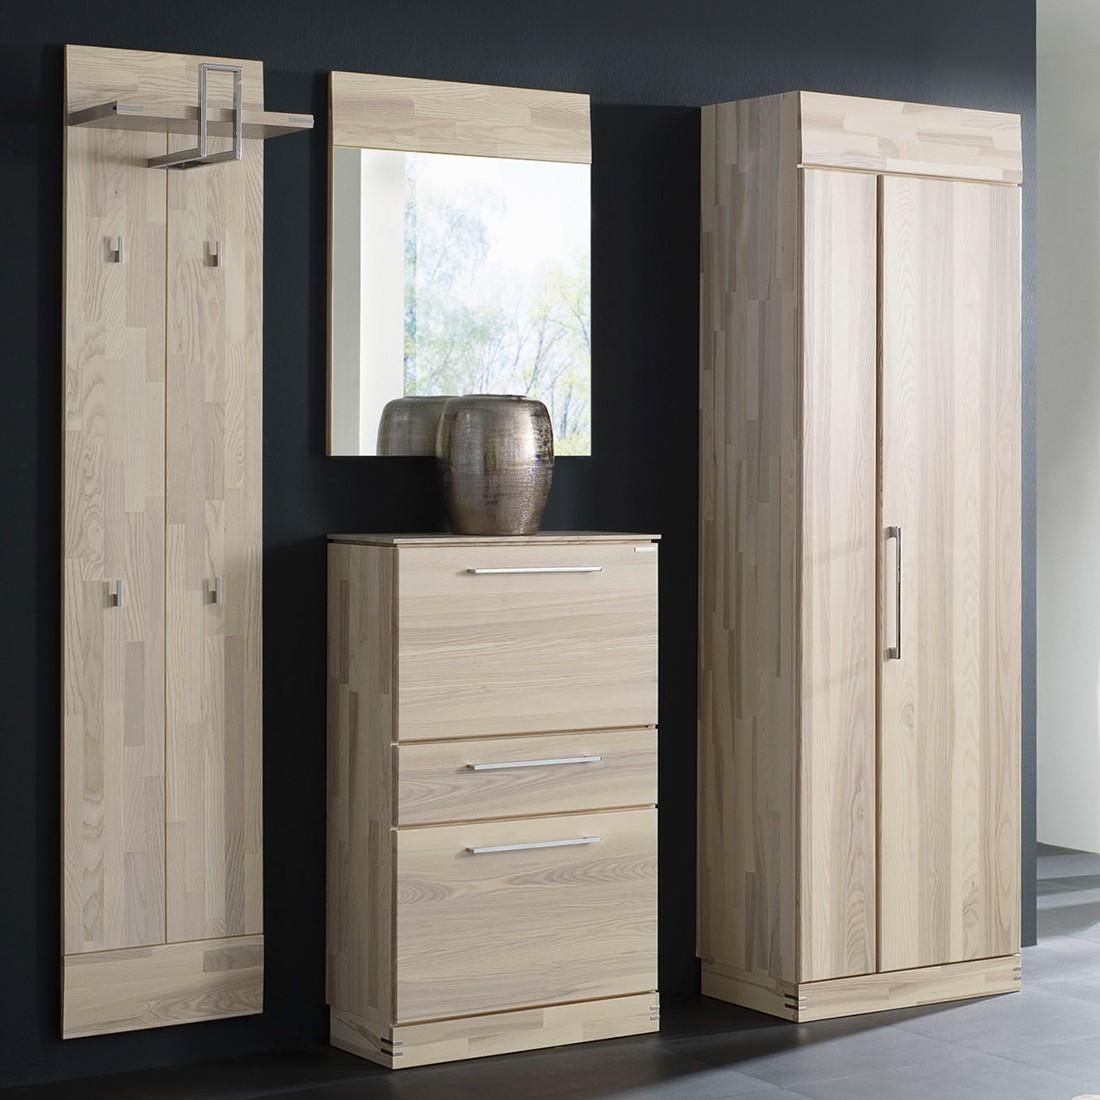 garderobenset terra ii 4 teilig kernesche massiv. Black Bedroom Furniture Sets. Home Design Ideas